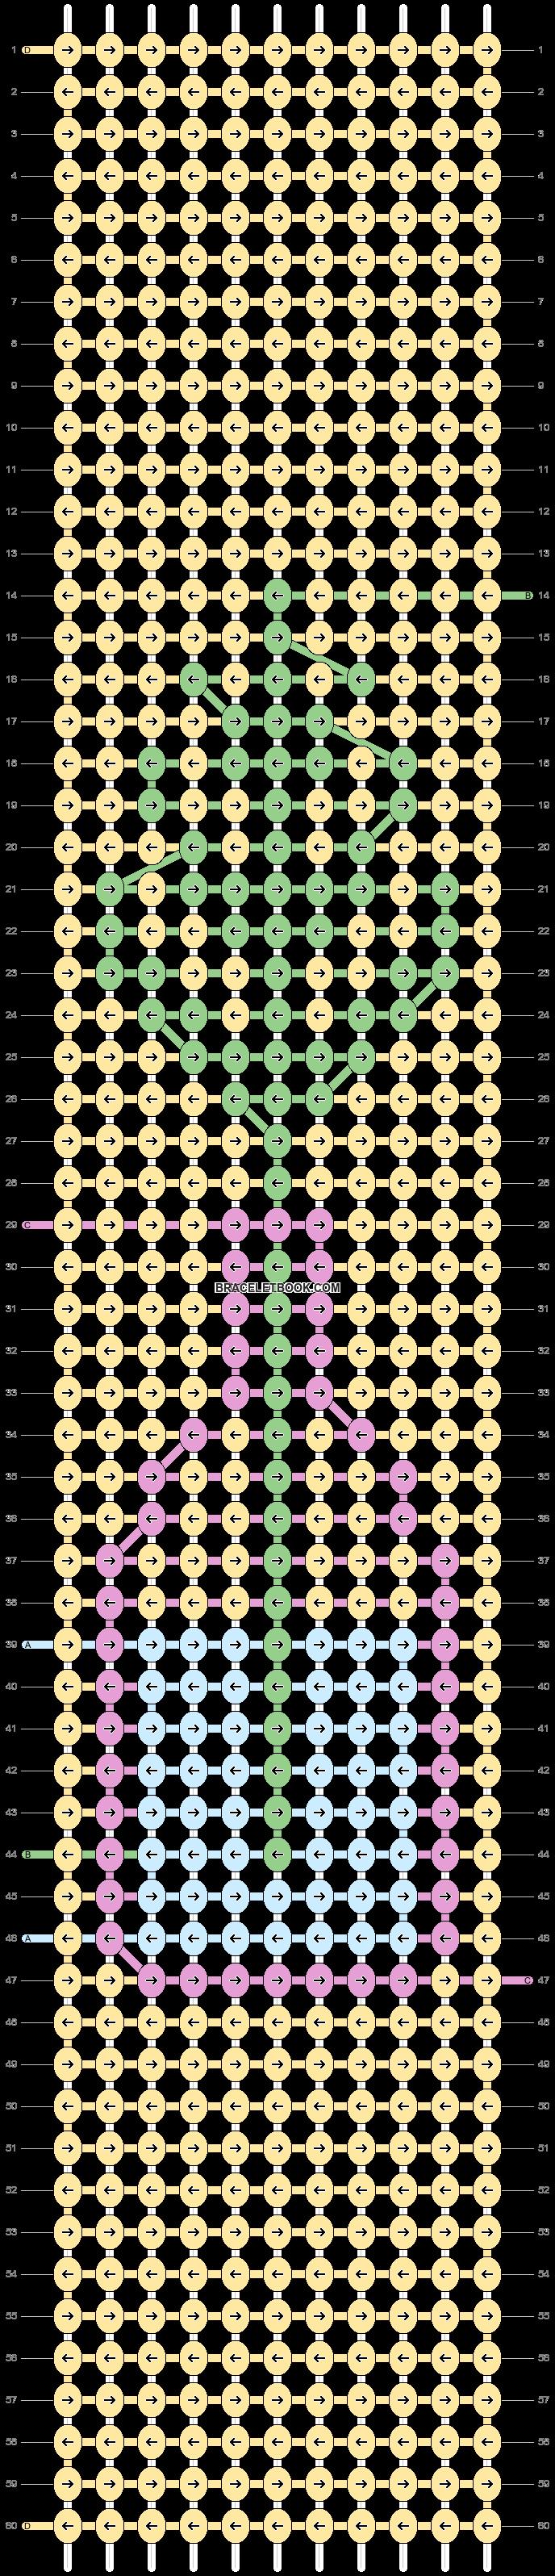 Alpha pattern #38260 pattern